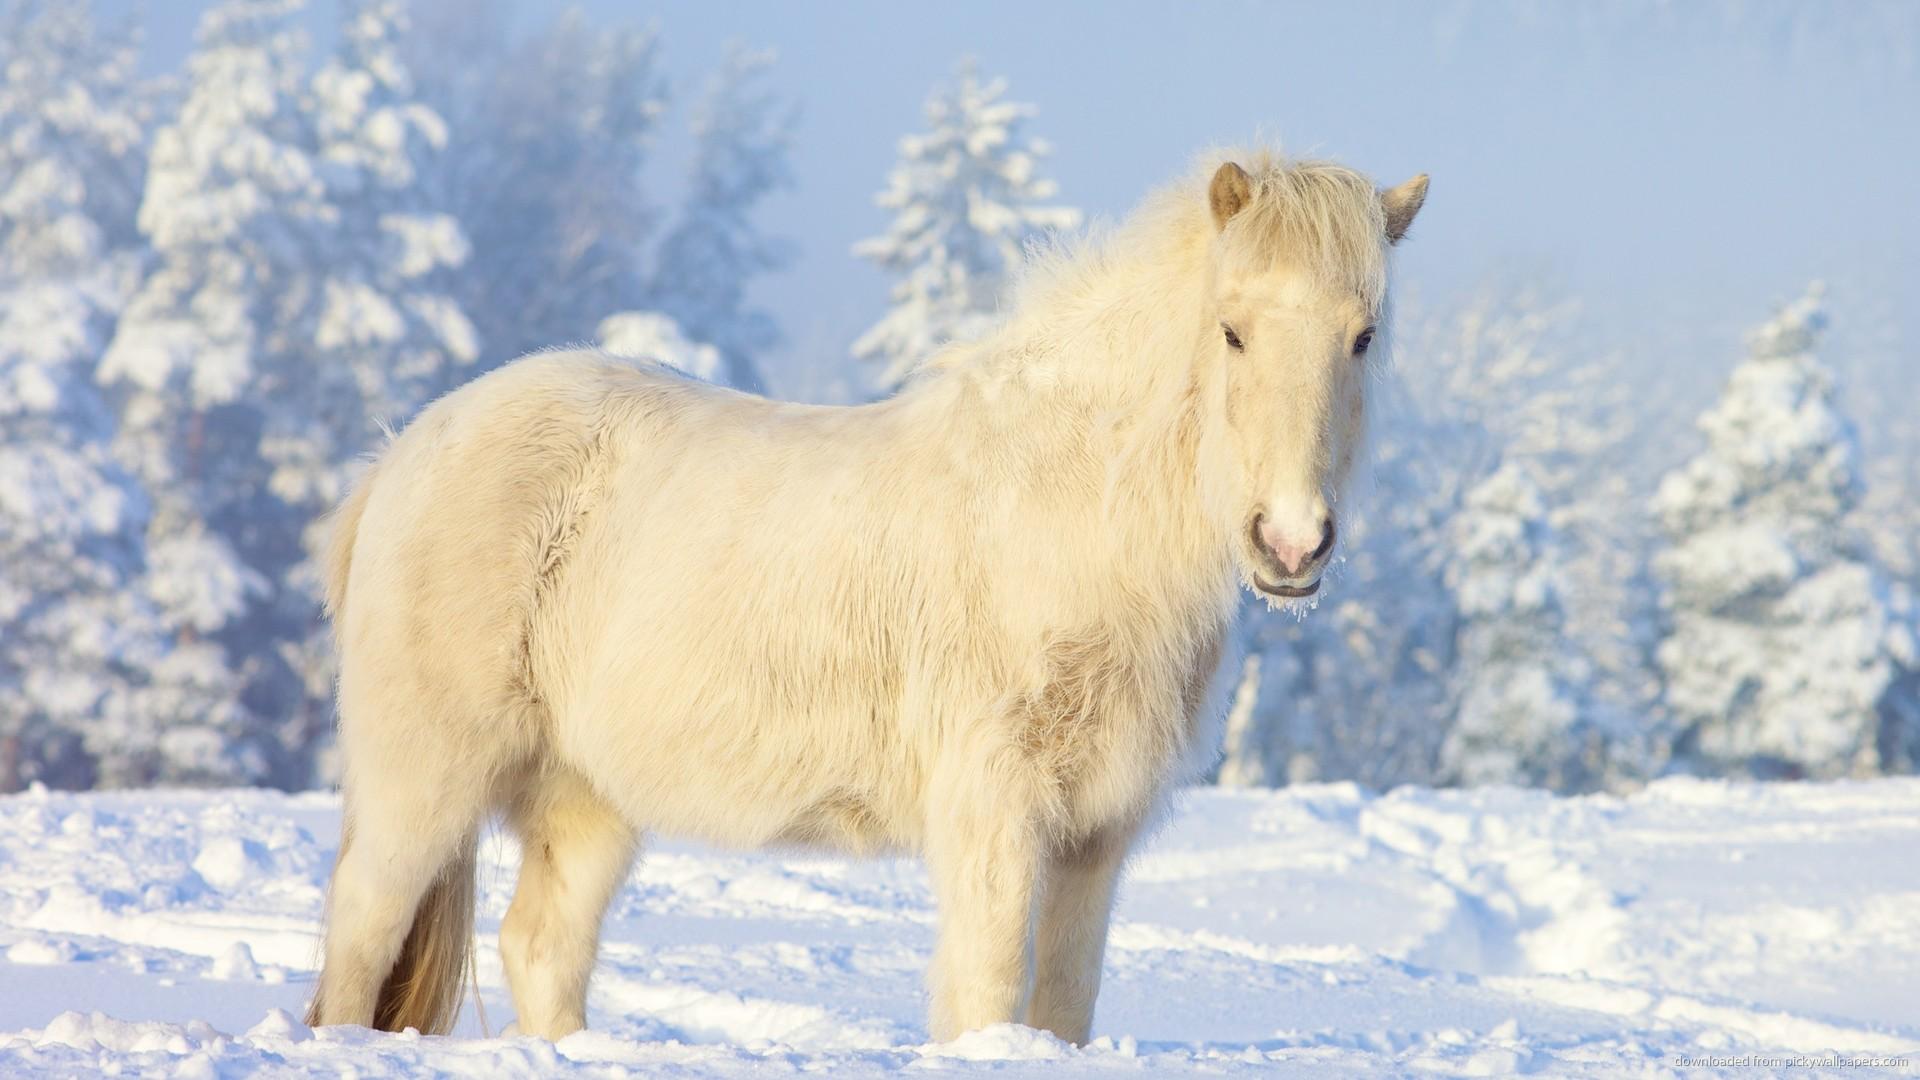 Yakutian Horse Picture For iPhone Blackberry iPad Yakutian Horse 1920x1080